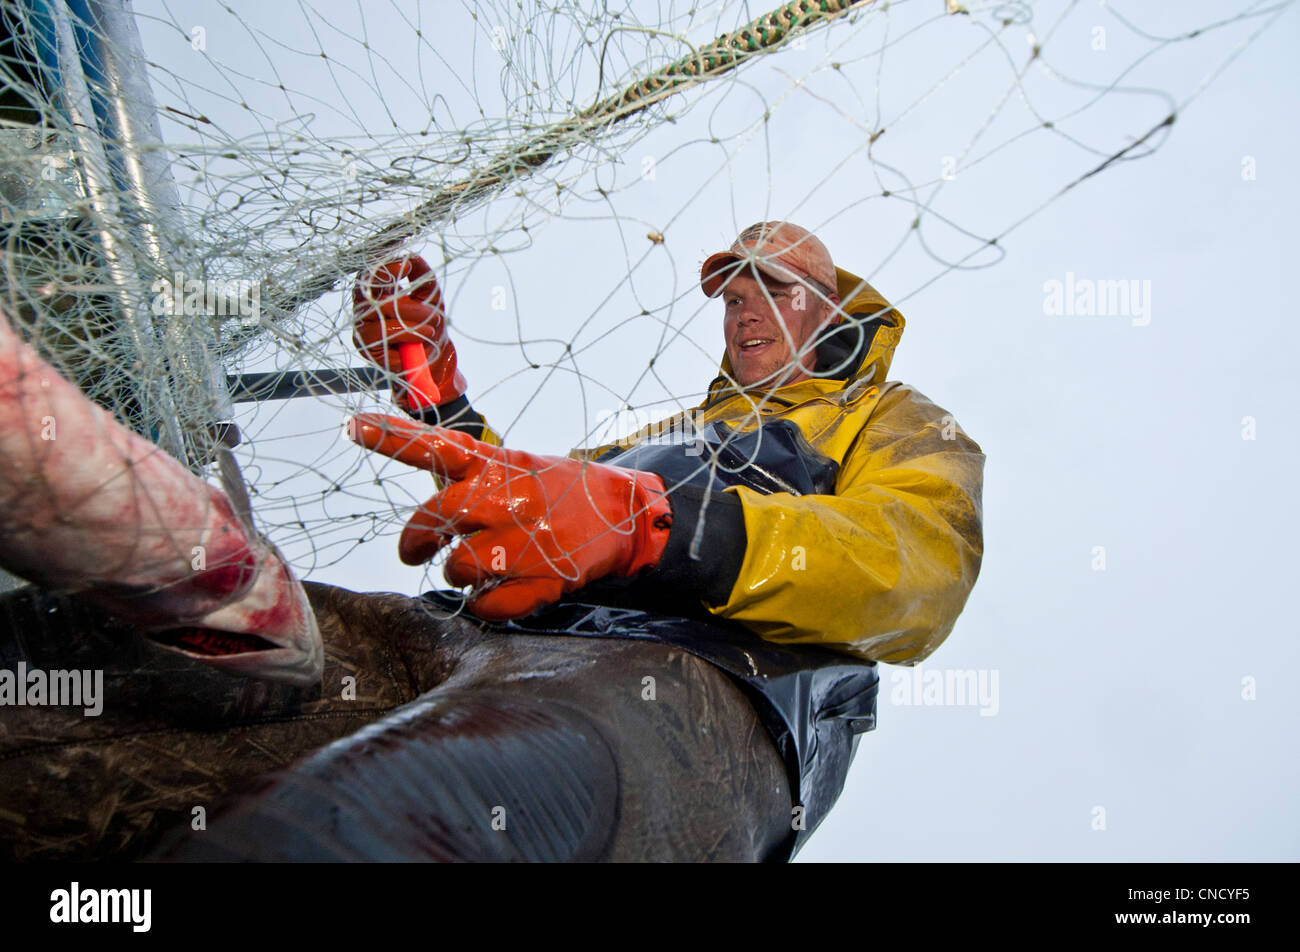 Commercial fisherman picks sockeye salmon off a gillnet at a set net site in the Naknek River, Bristol Bay, Alaska, - Stock Image